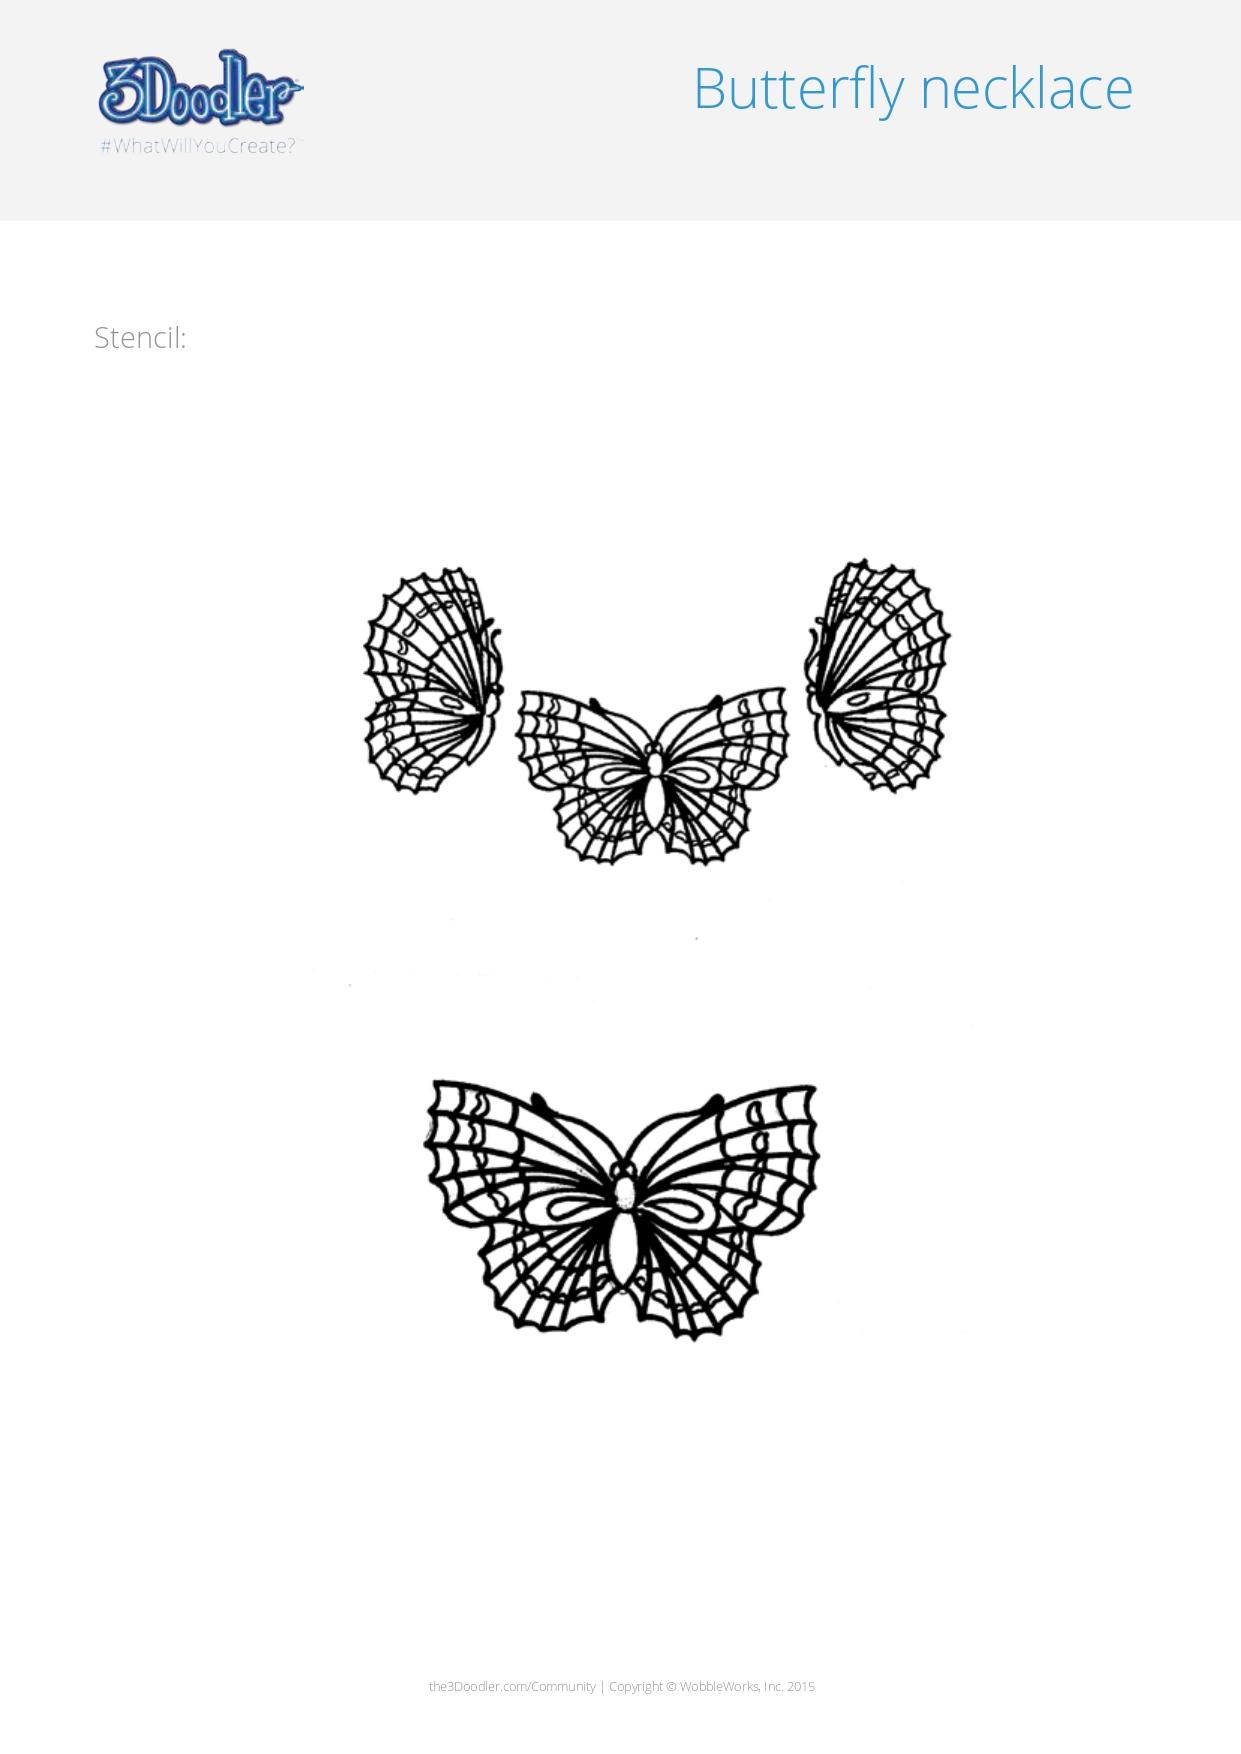 3D Pen Stencil Template Butterfly Necklace